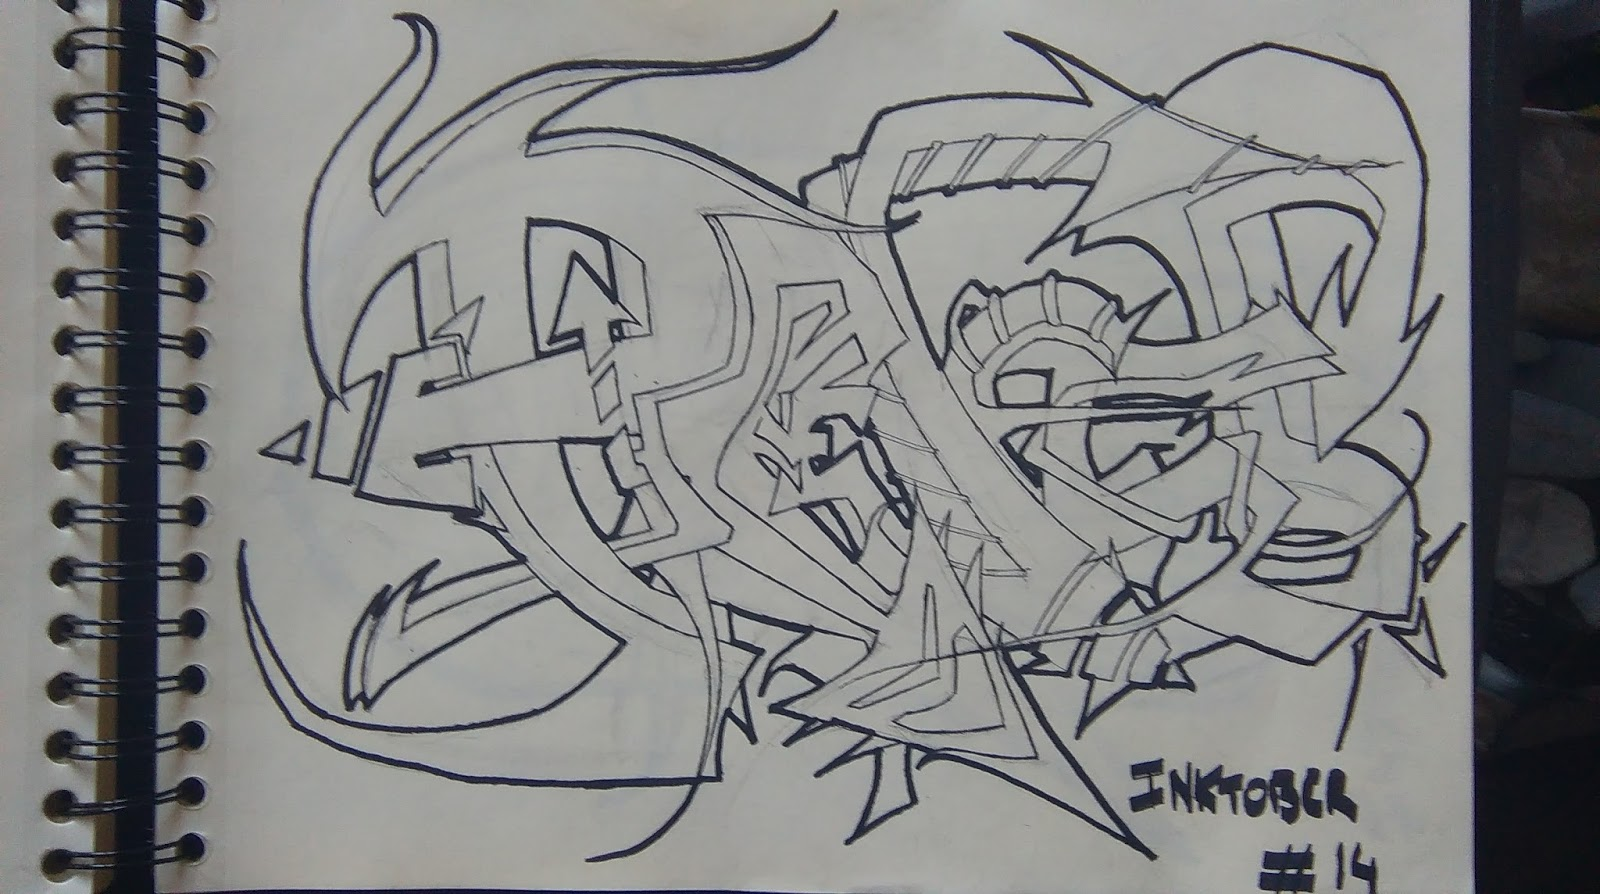 [SPOLYK] - Geometries & sketches IMAG0016